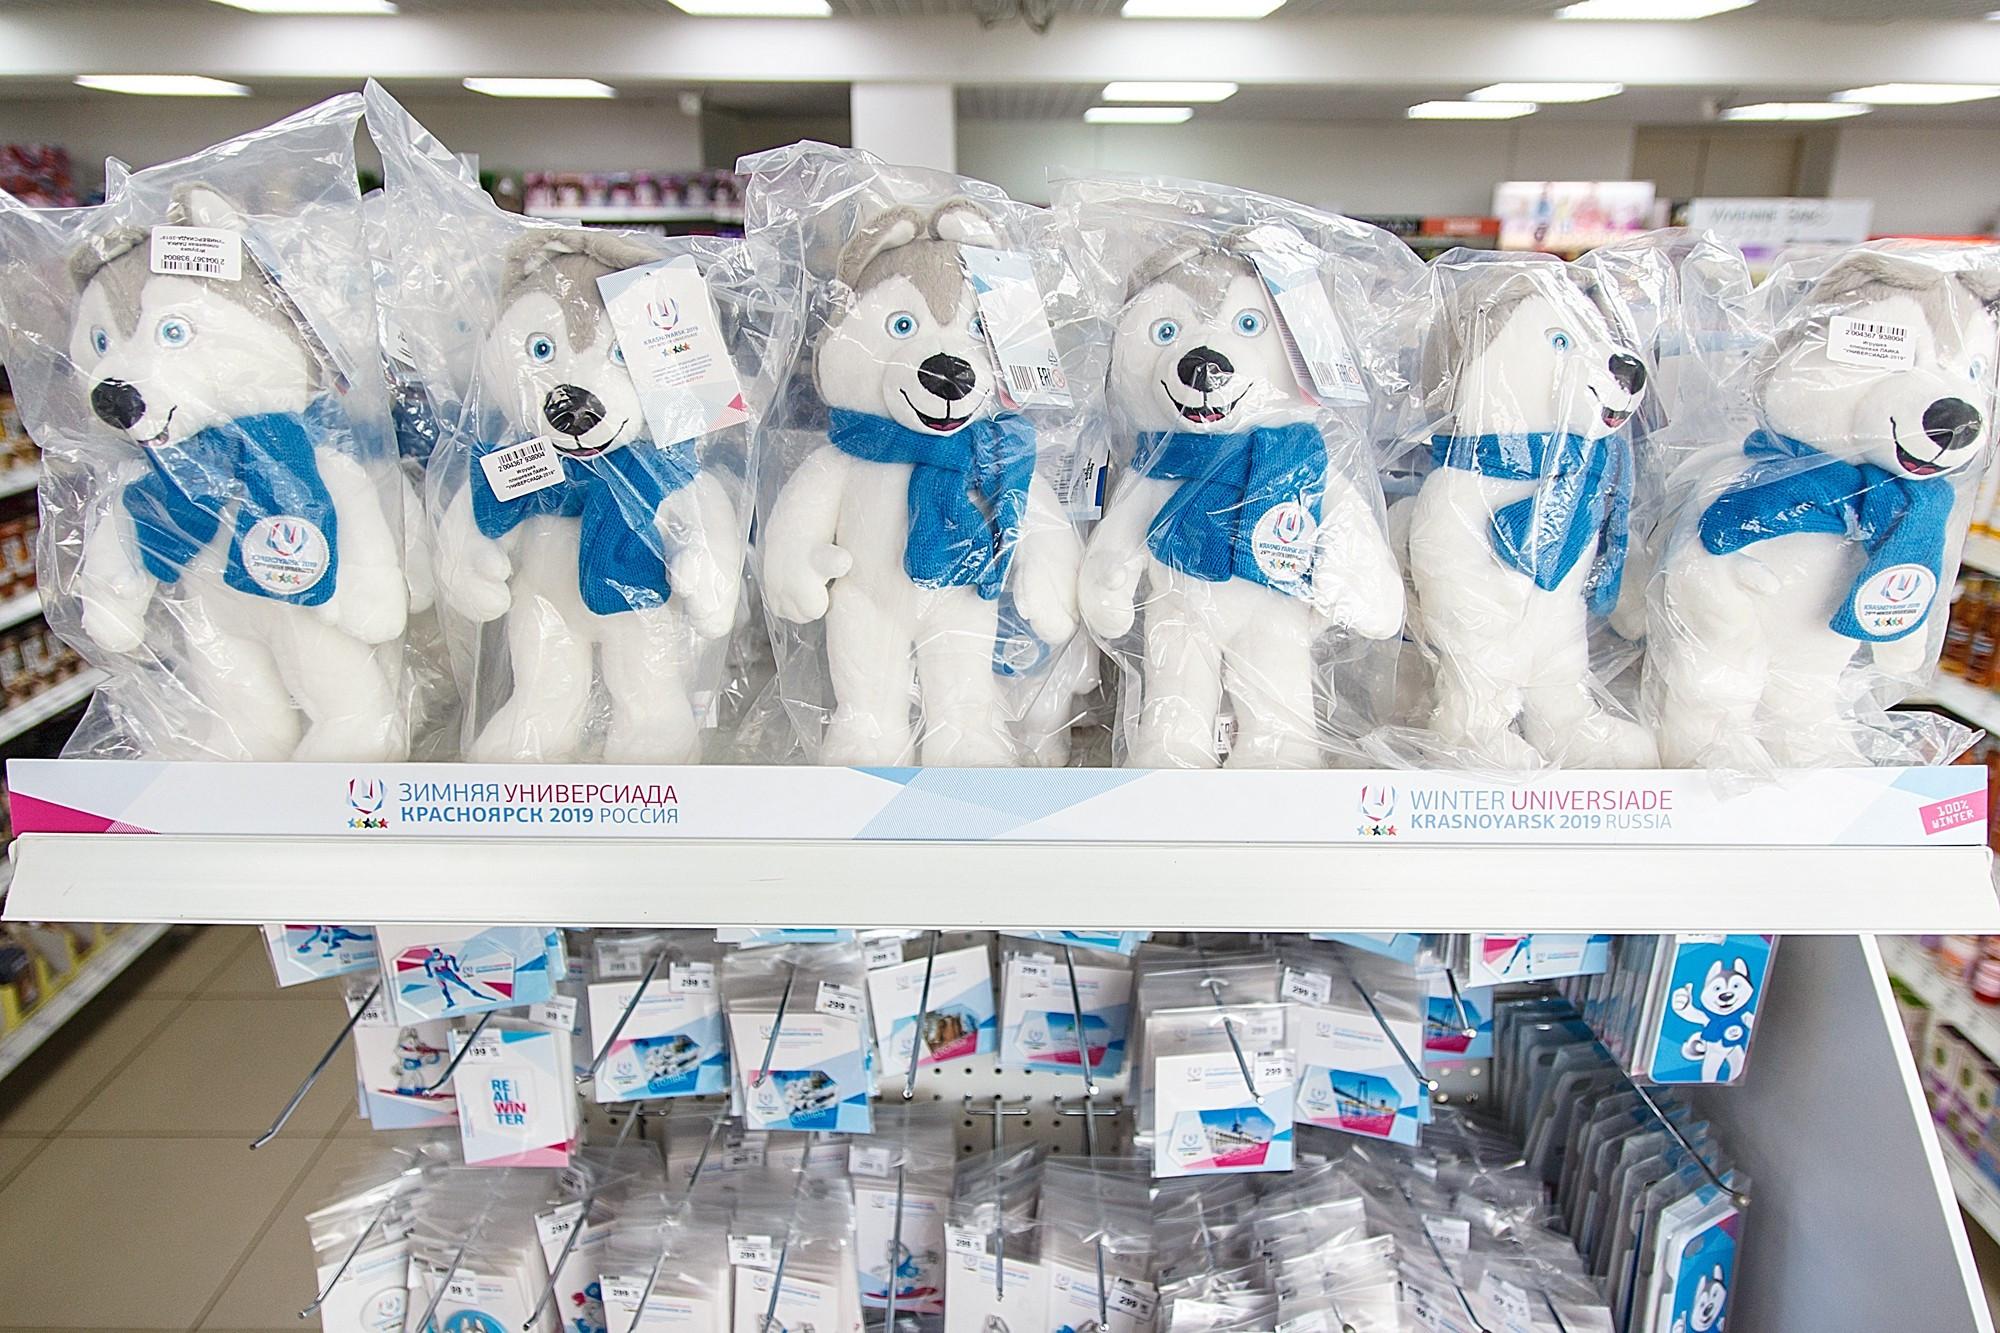 Krasnoyarsk 2019 U-Laika mascots now on sale to public